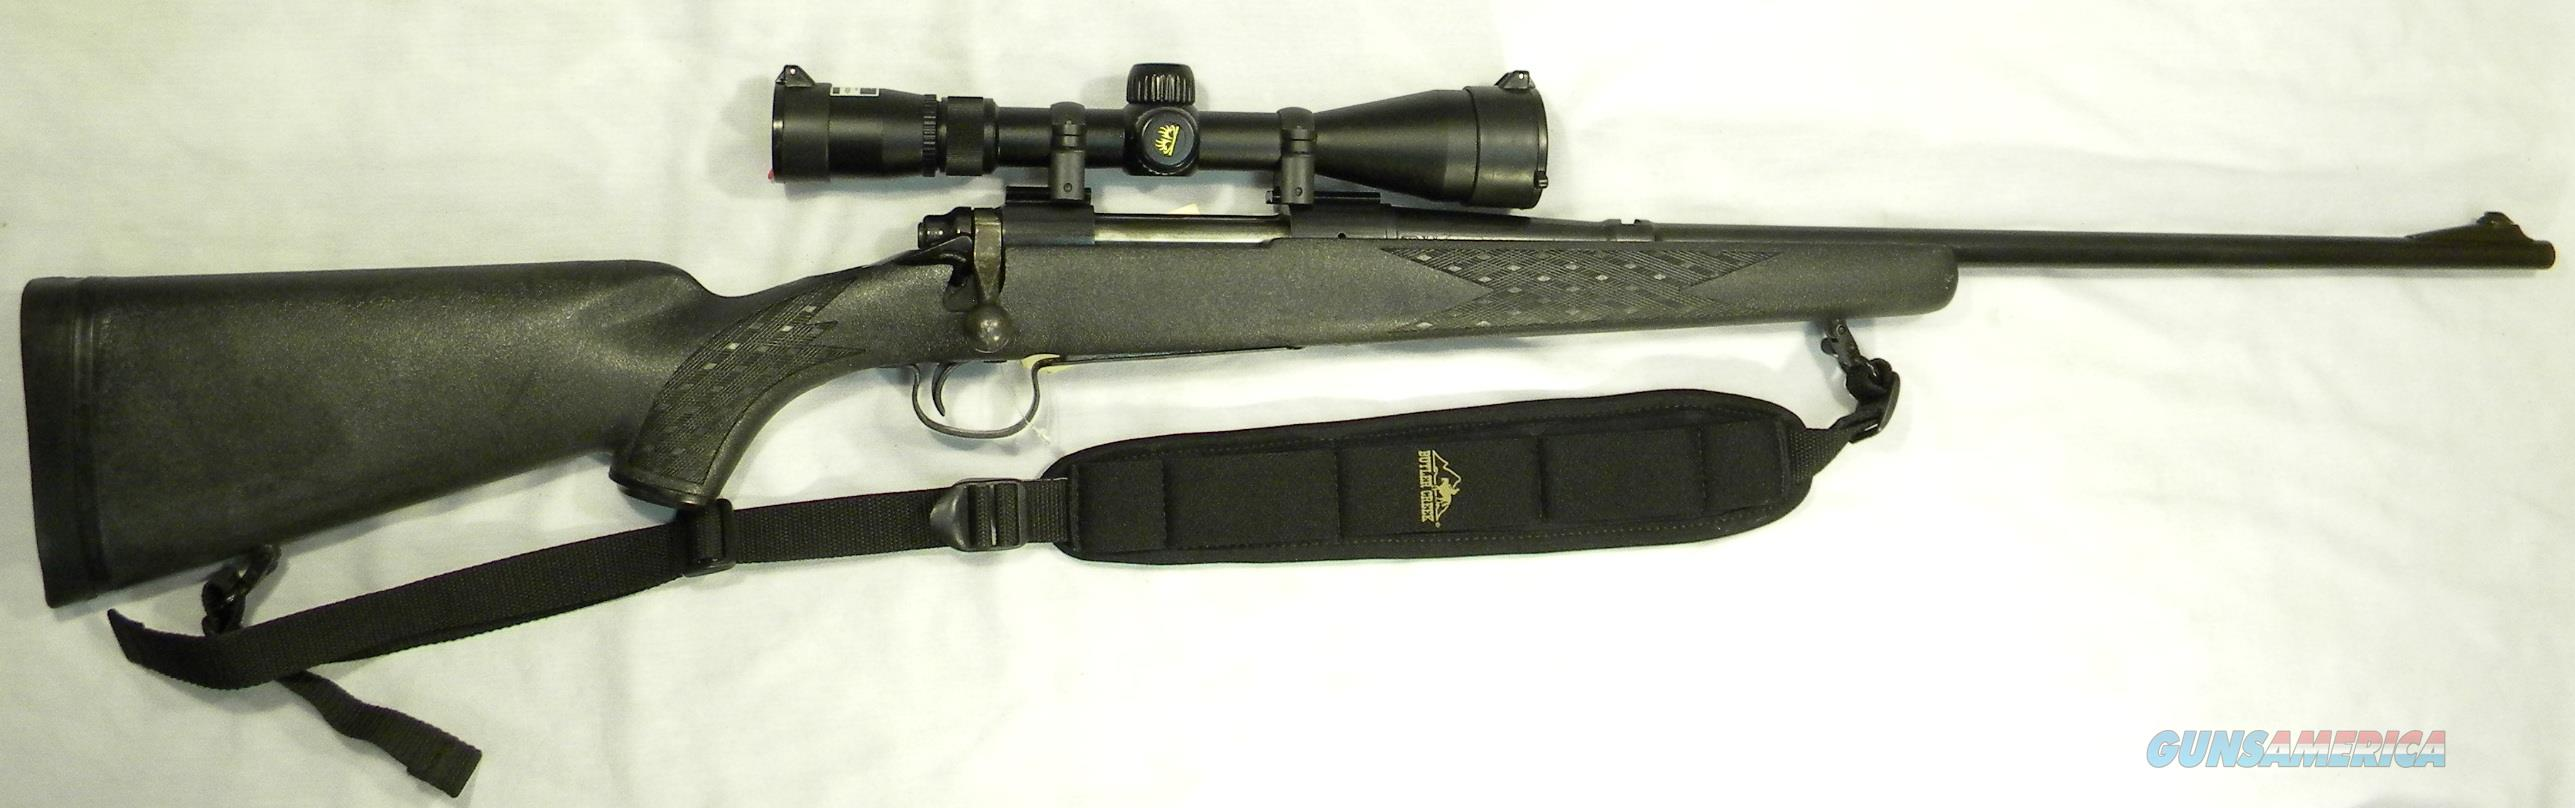 Remington 721 .30-06 Bolt-Action Rifle, Price Reduced!  Guns > Rifles > Remington Rifles - Modern > Bolt Action Non-Model 700 > Sporting